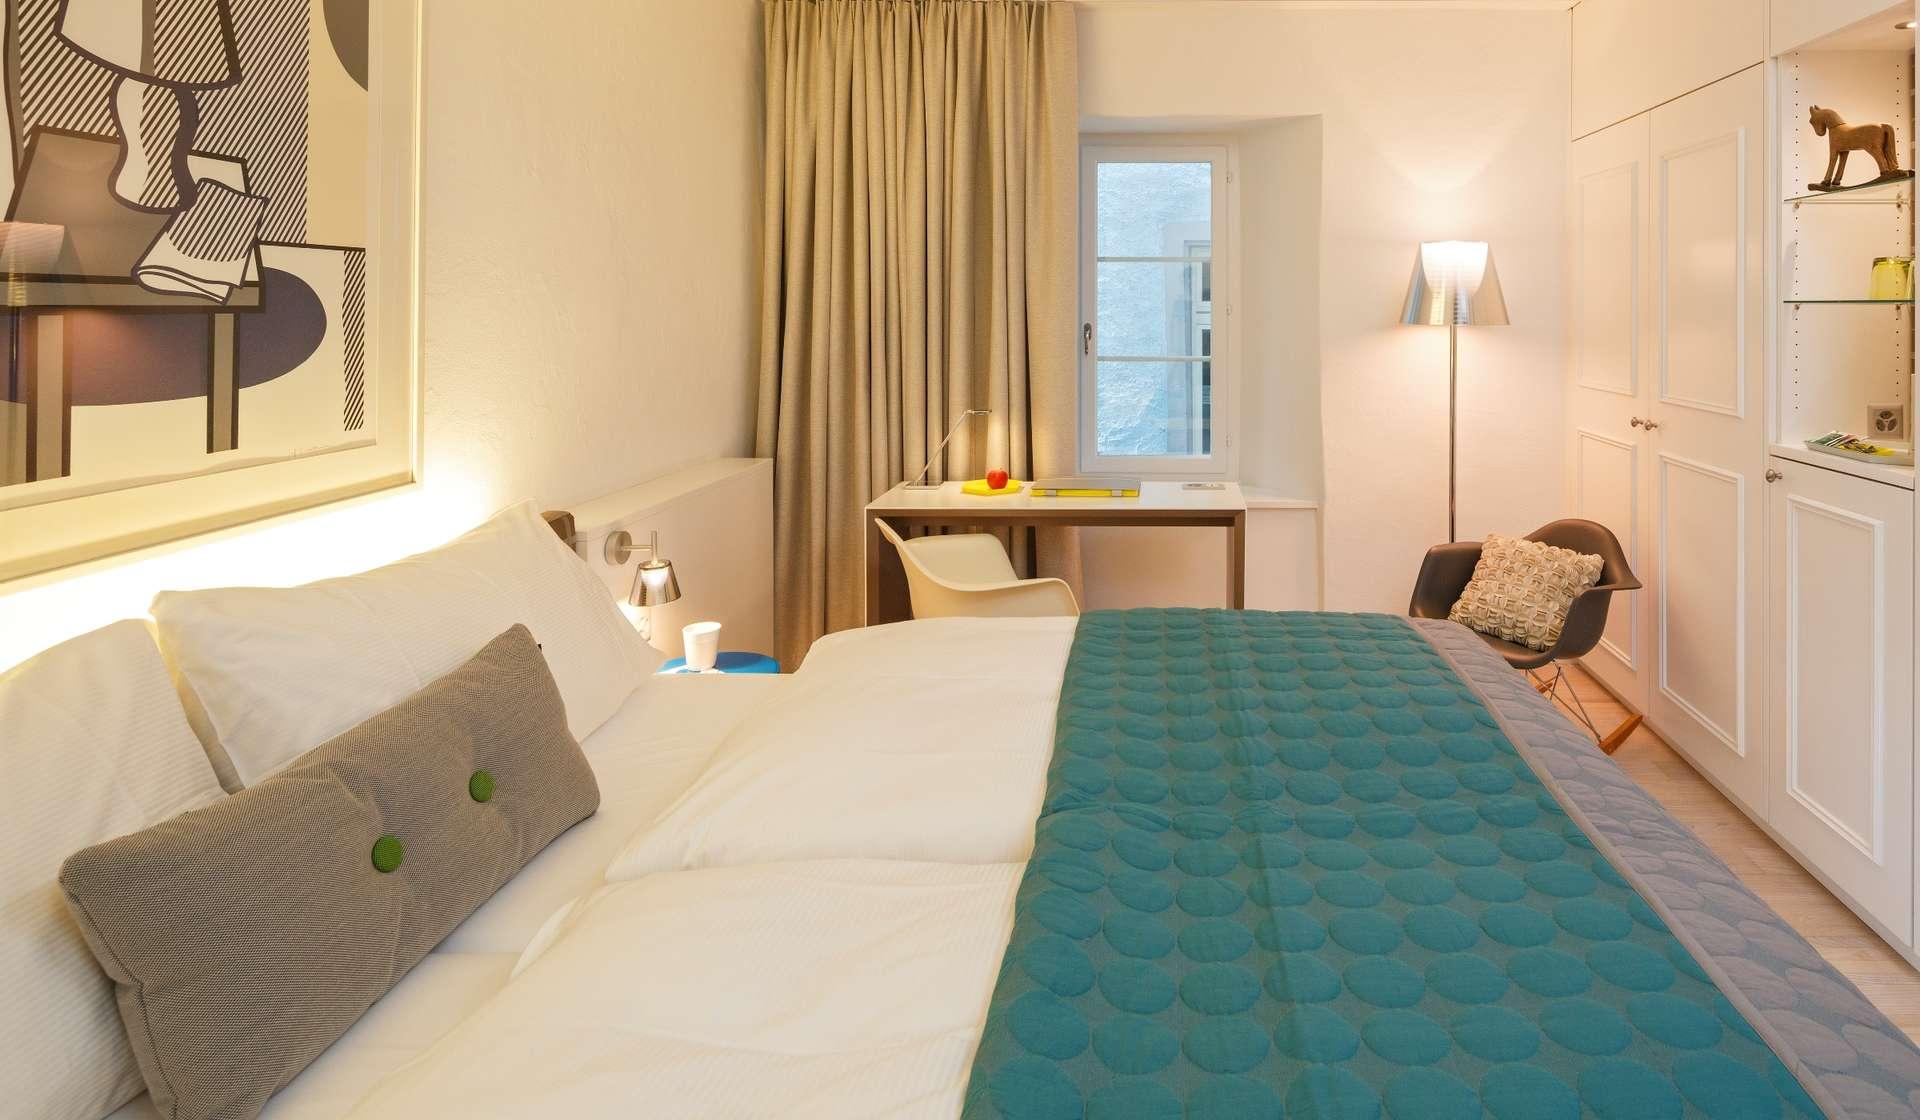 csm_Hotel_Roessli_Zuerich_Schweiz_Doppelzimmer_Bett_5f03a66cee